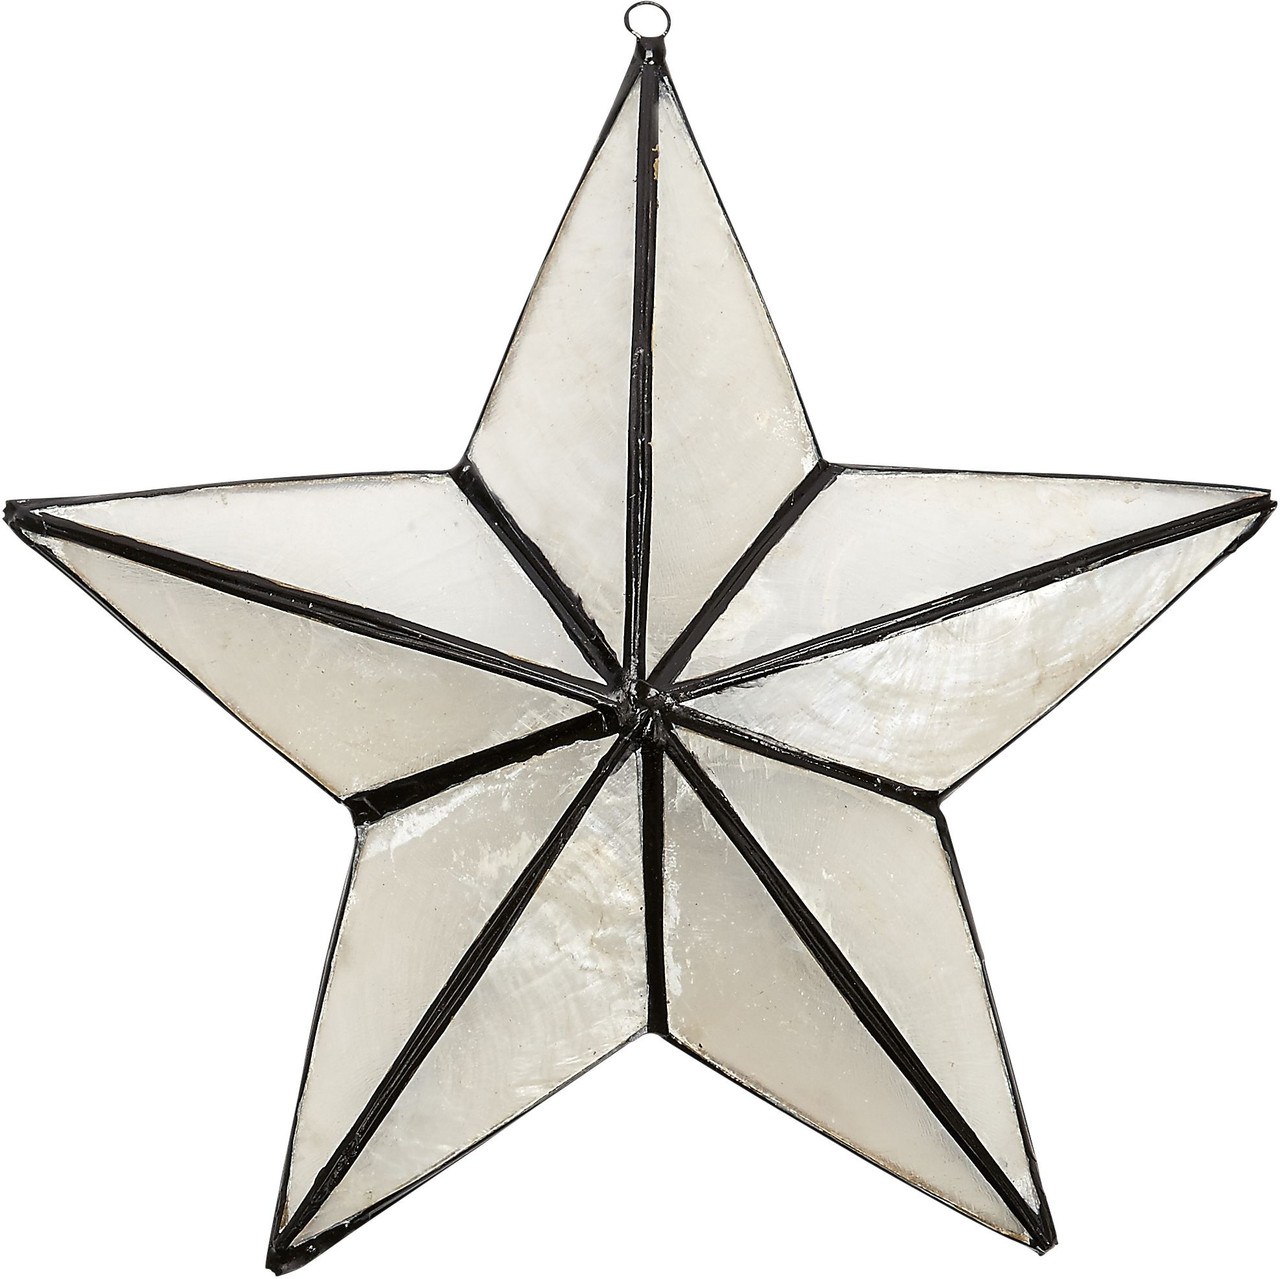 Capiz 3D Star Ornament - White and Black